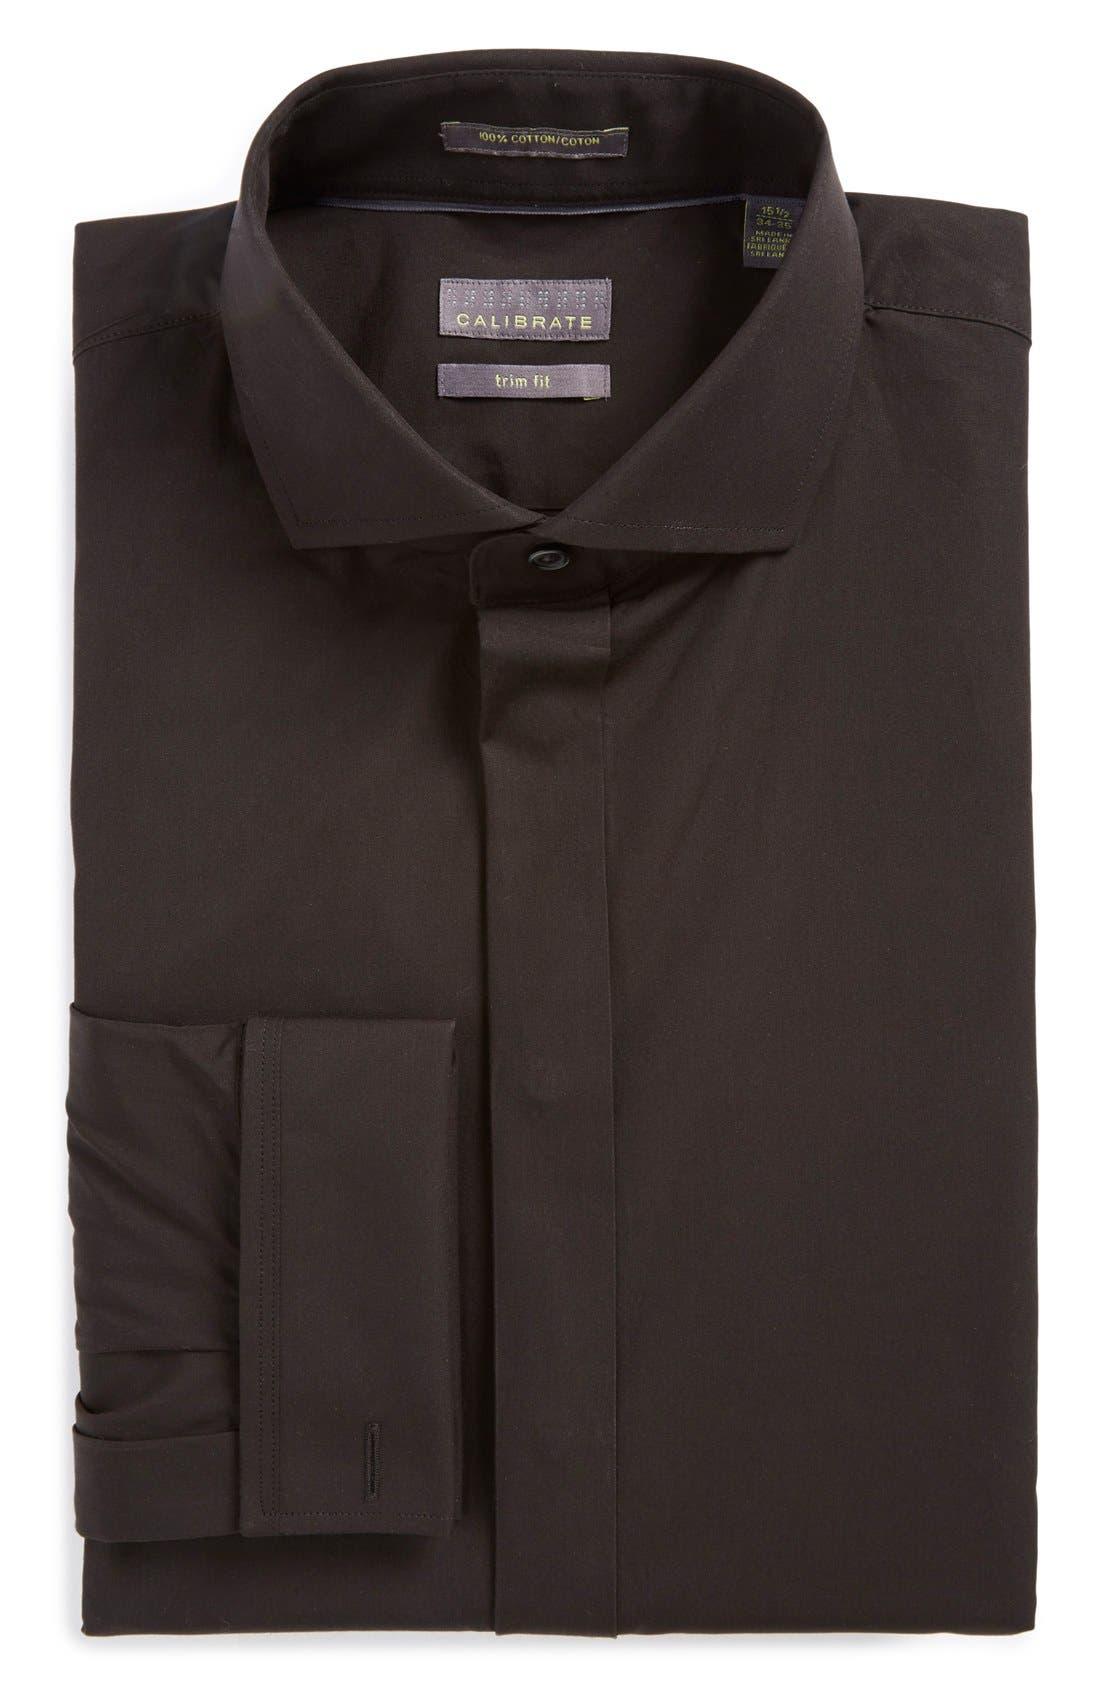 Alternate Image 1 Selected - Calibrate Trim Fit Solid Tuxedo Shirt